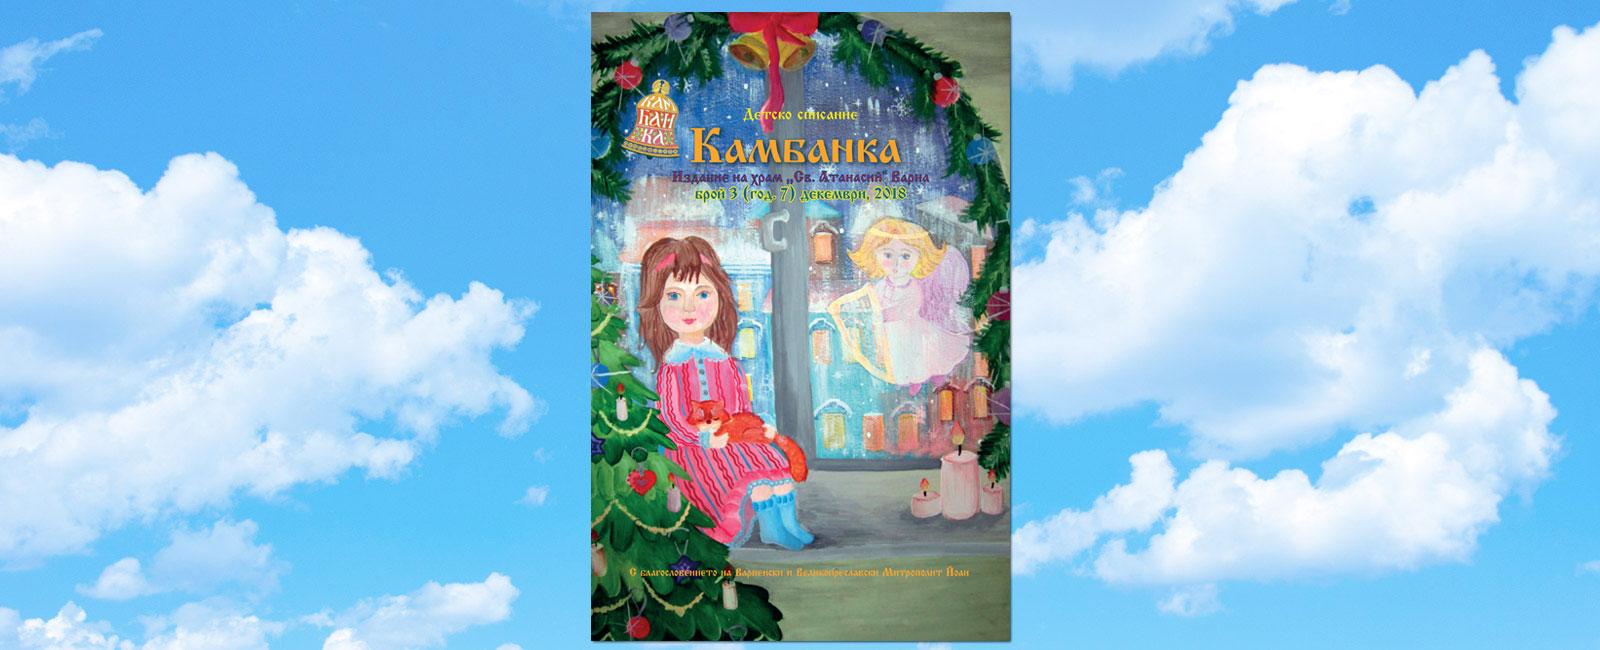 Kambanka_2018-12